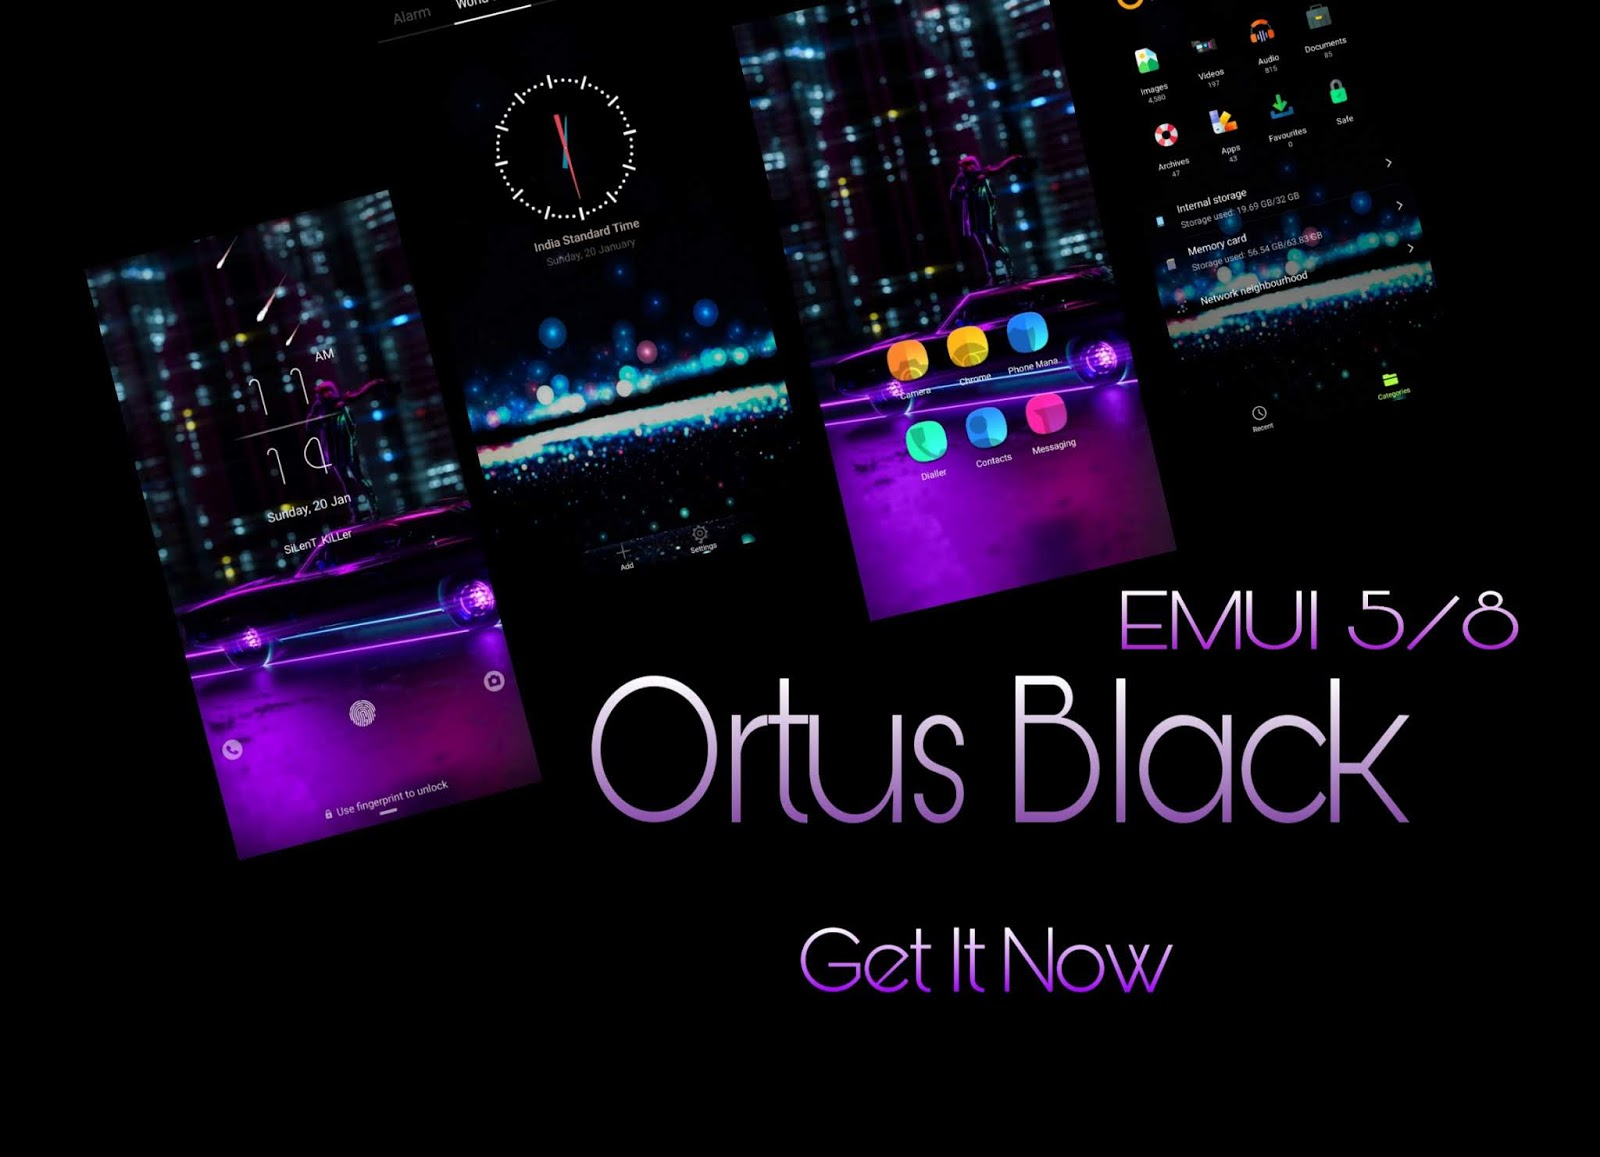 Ortus Black] Download Ortus Black Theme For EMUI 5/8 - EMUI